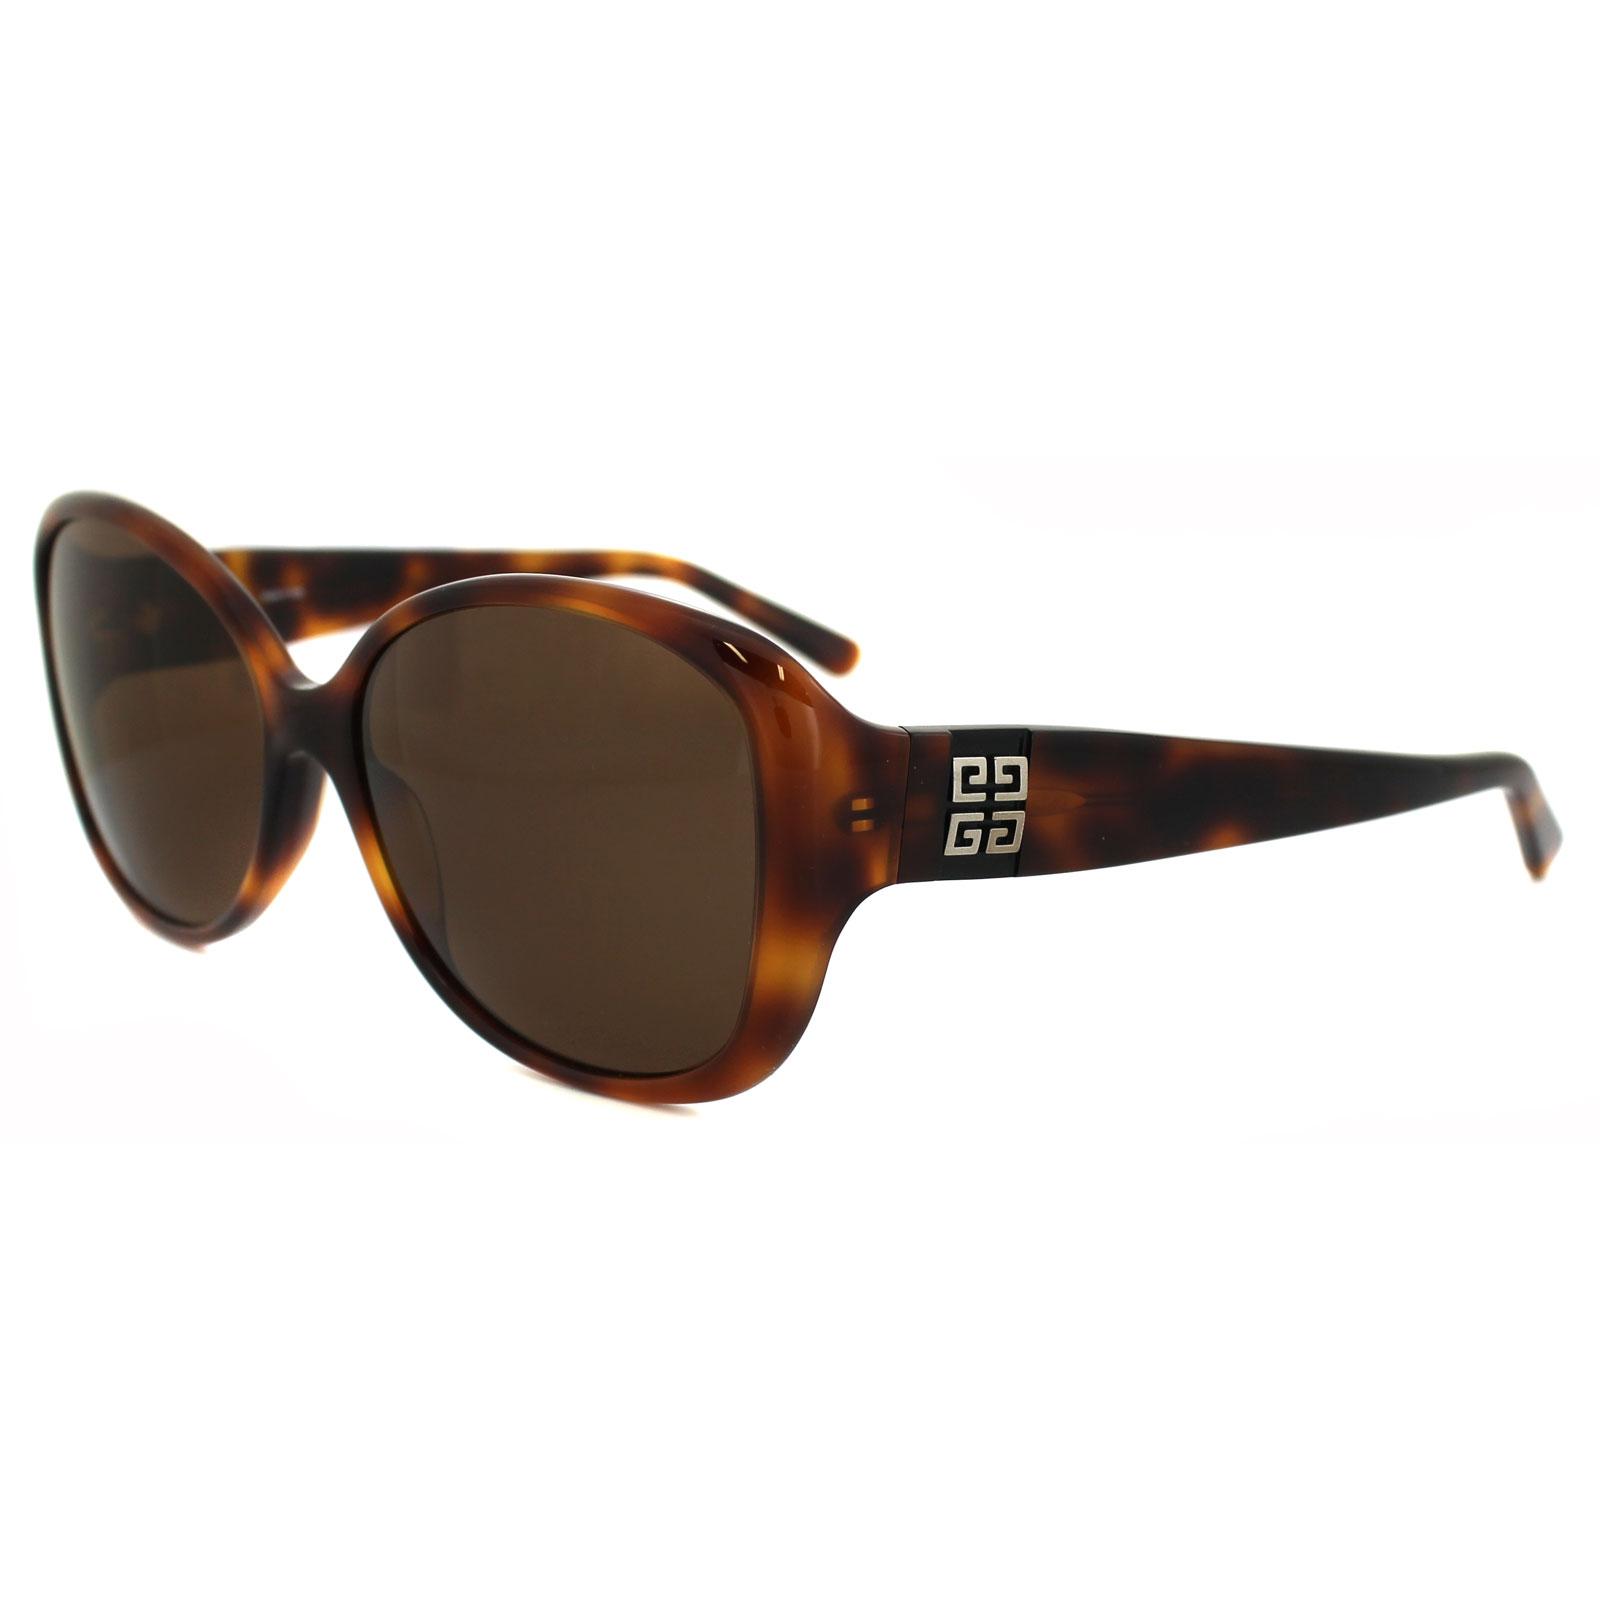 30b79a6a3 Givenchy Sunglasses SGV760 752P Havana Brown 883663448453 | eBay